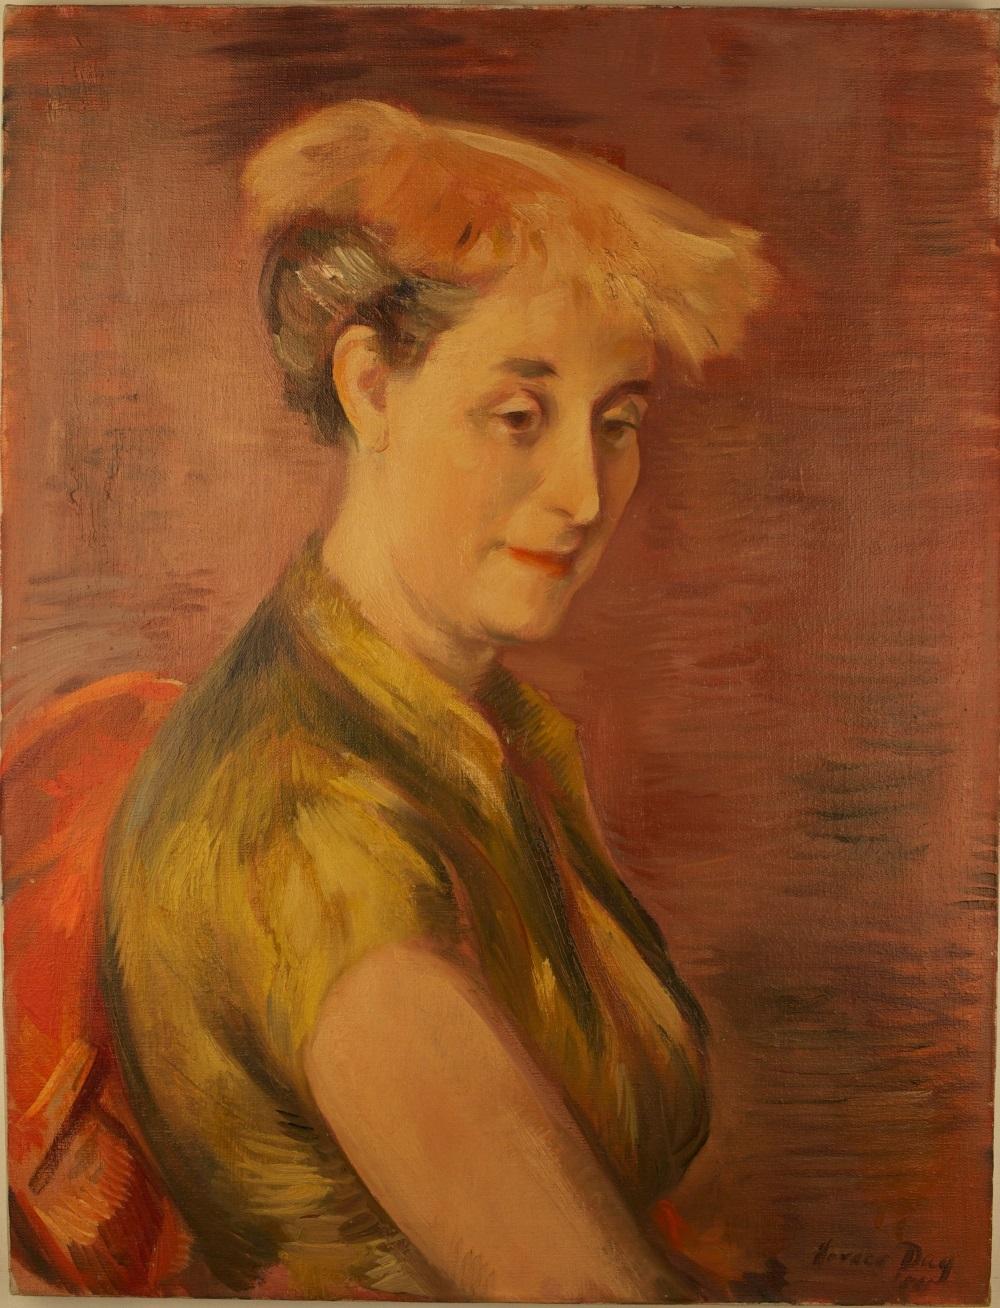 Portrait of Elizabeth Nottingham Day by her husband Horace Talmage Day, courtesy of Horace Talmage Day Jr.